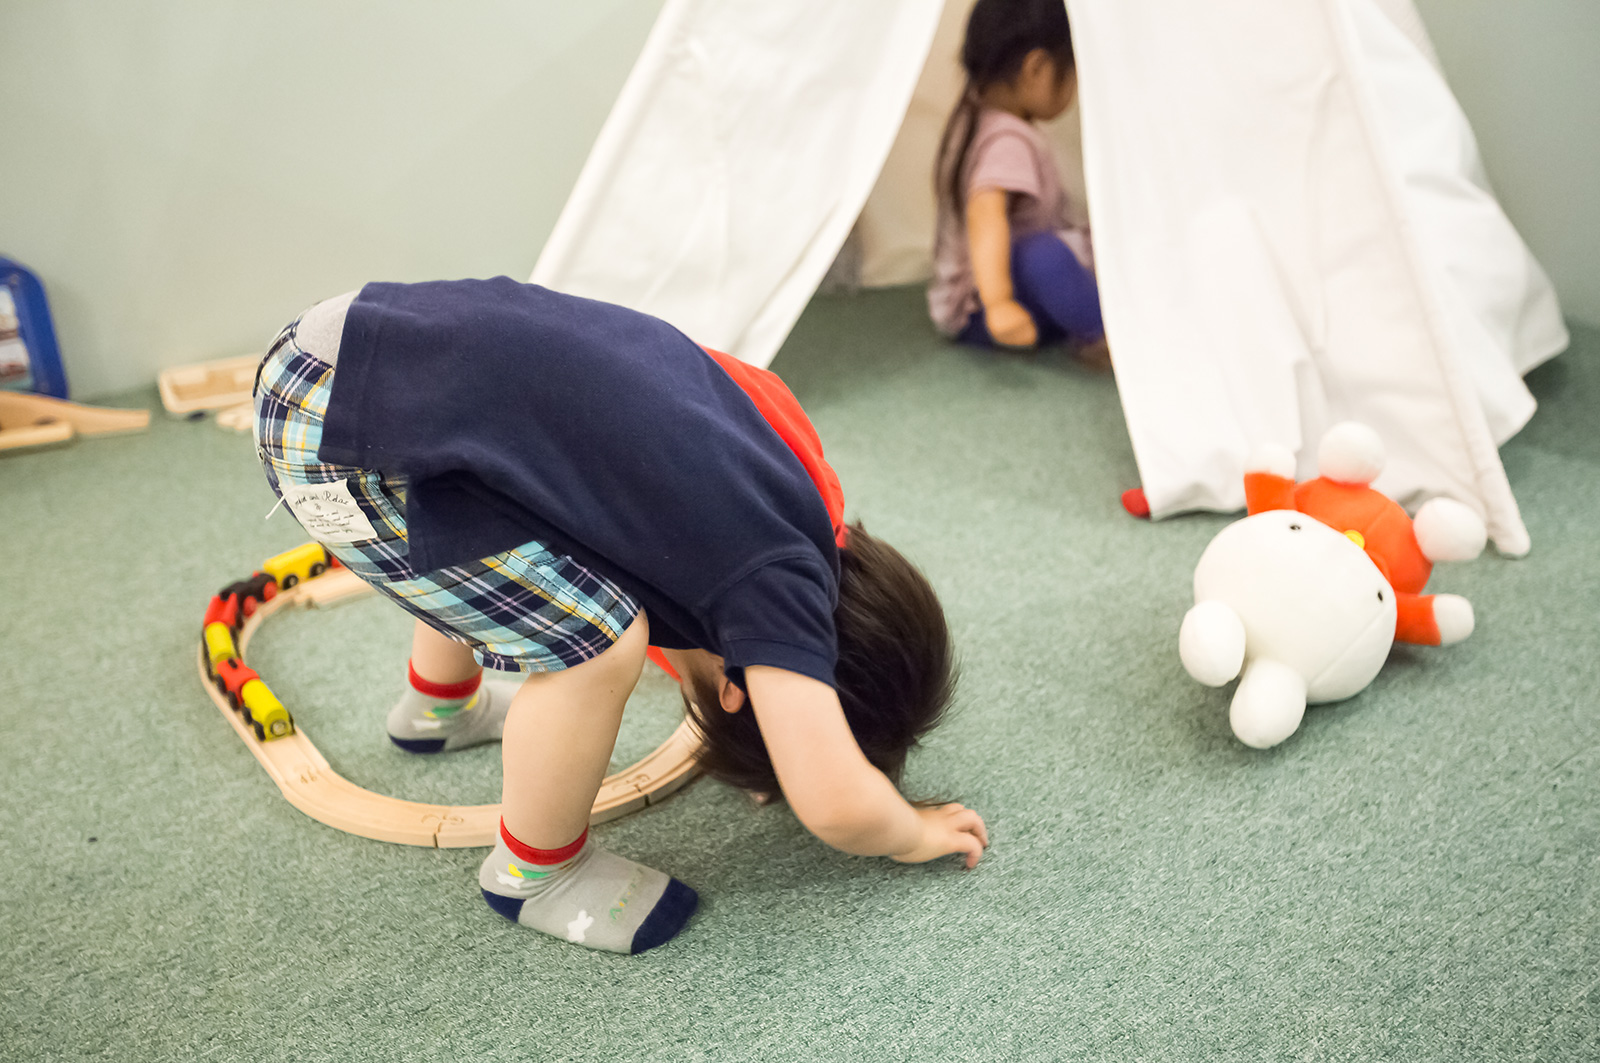 Nagatacho GRID kids room